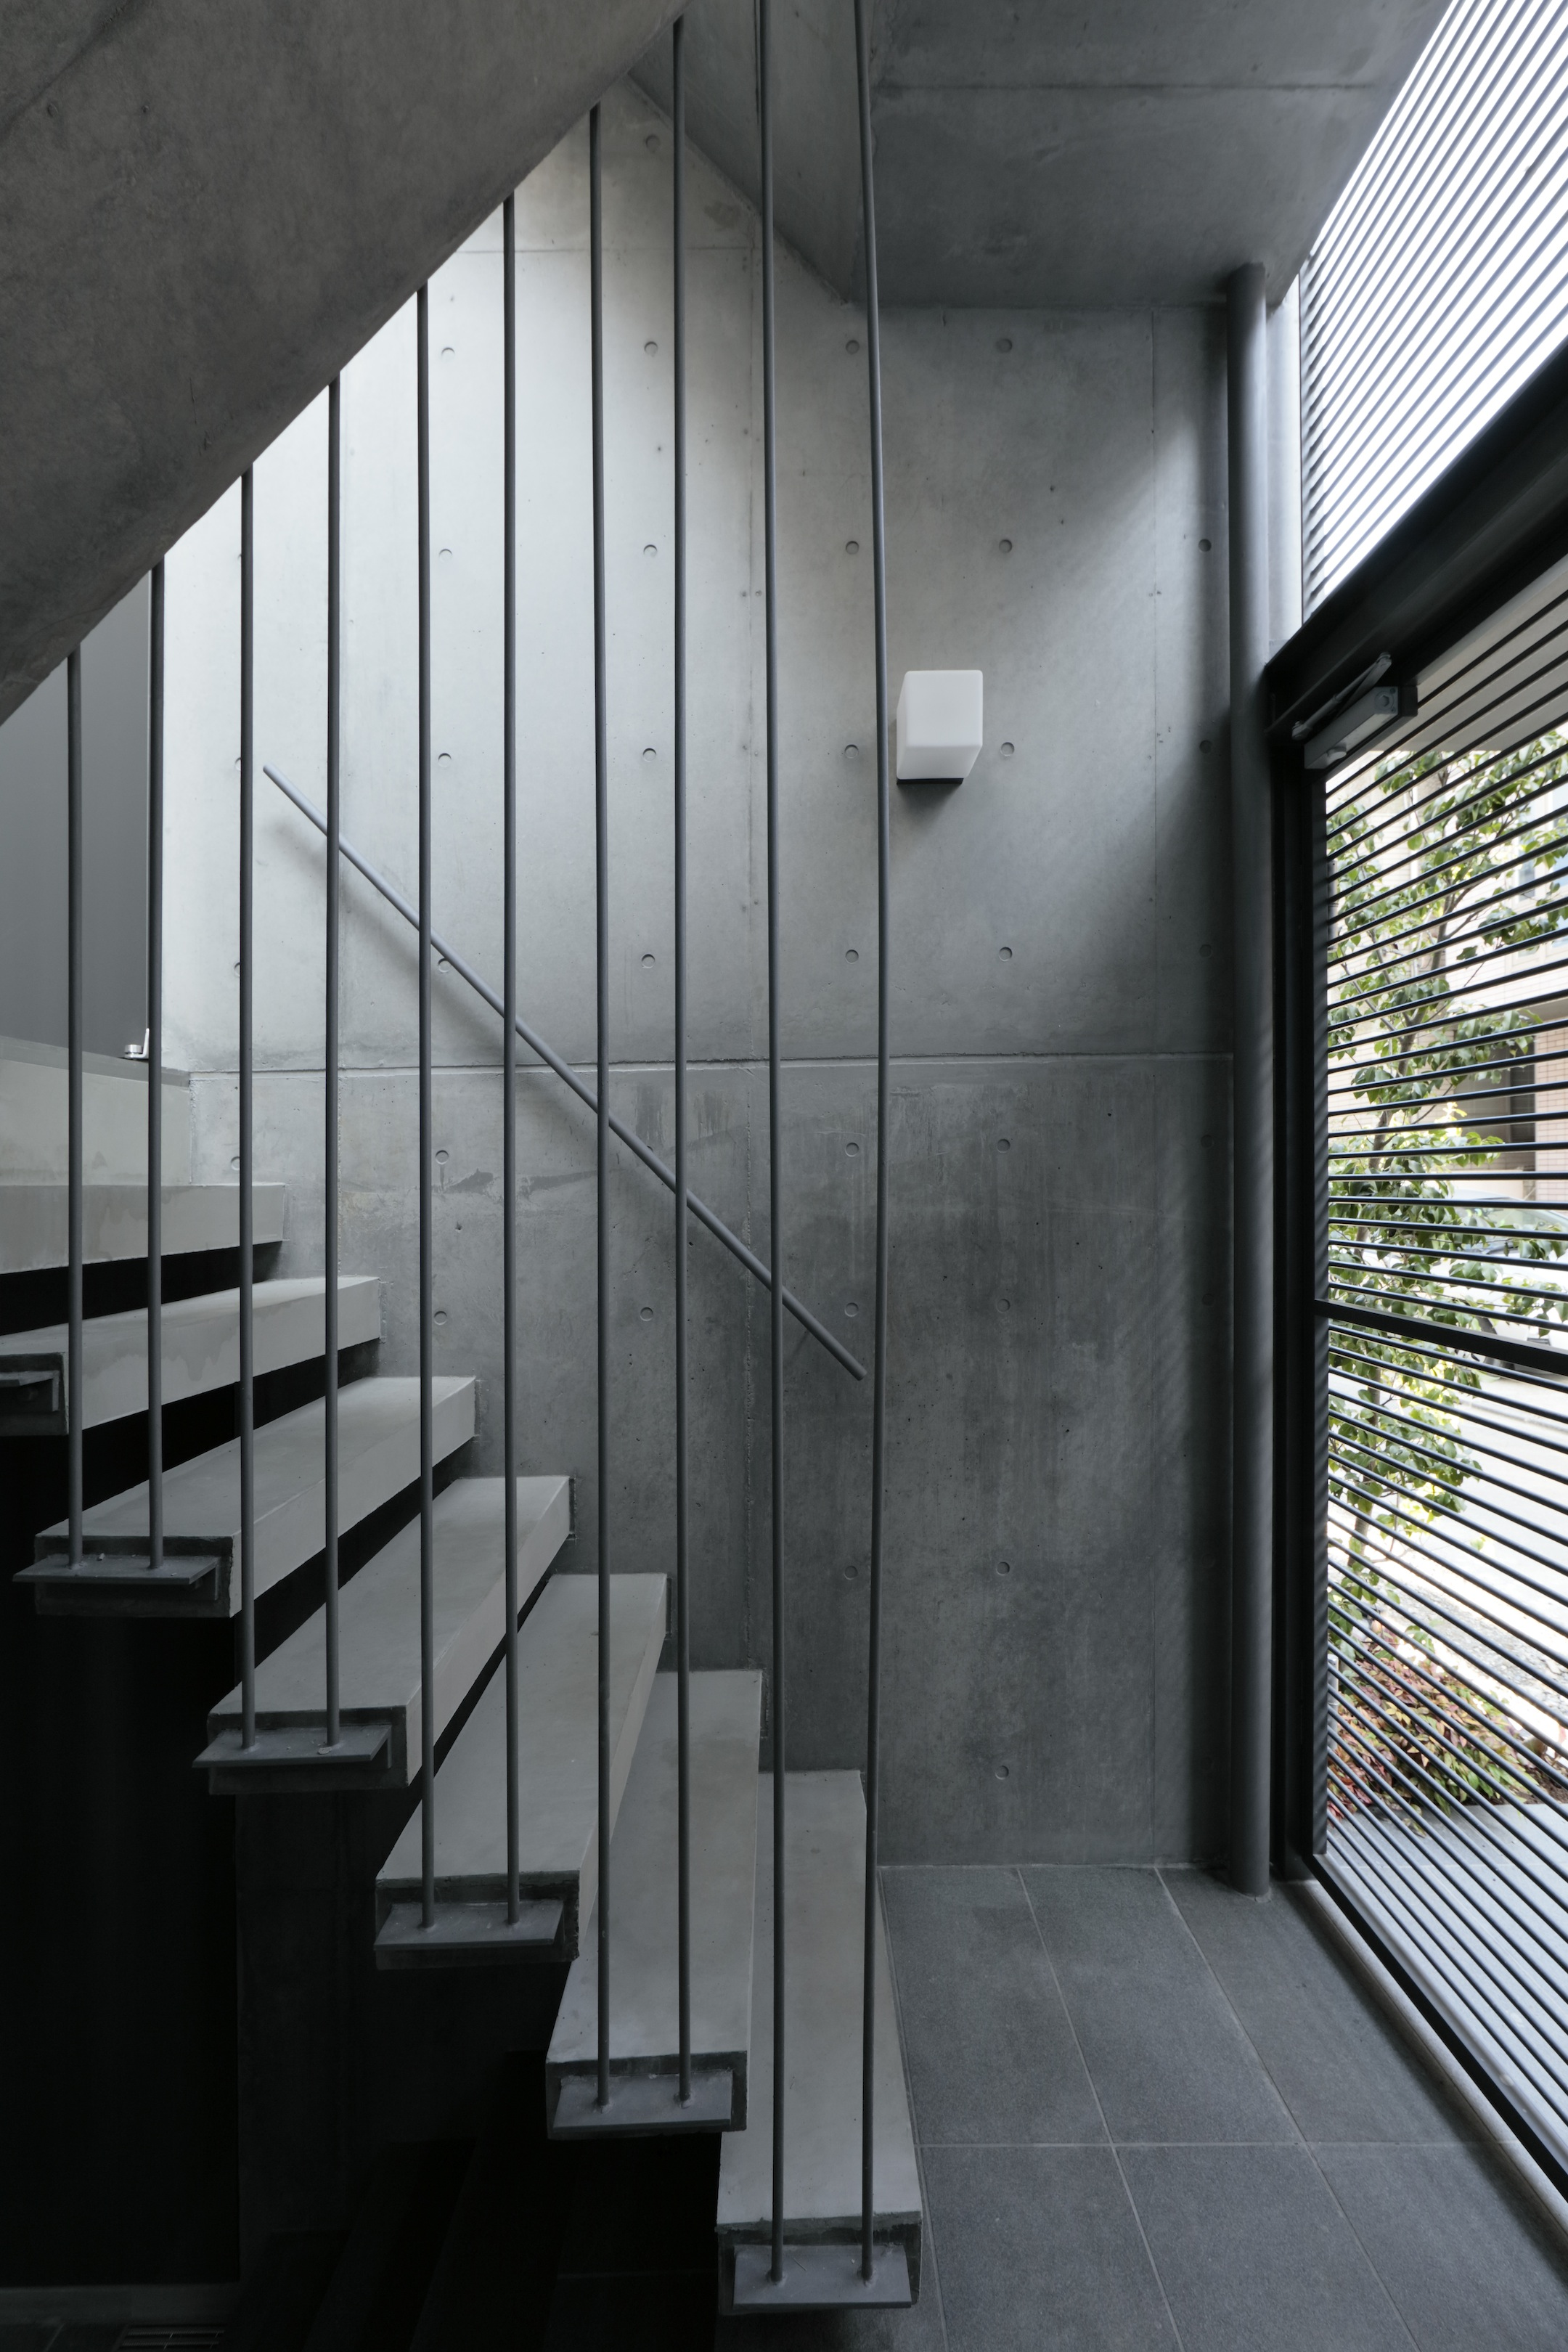 windowgarden_006